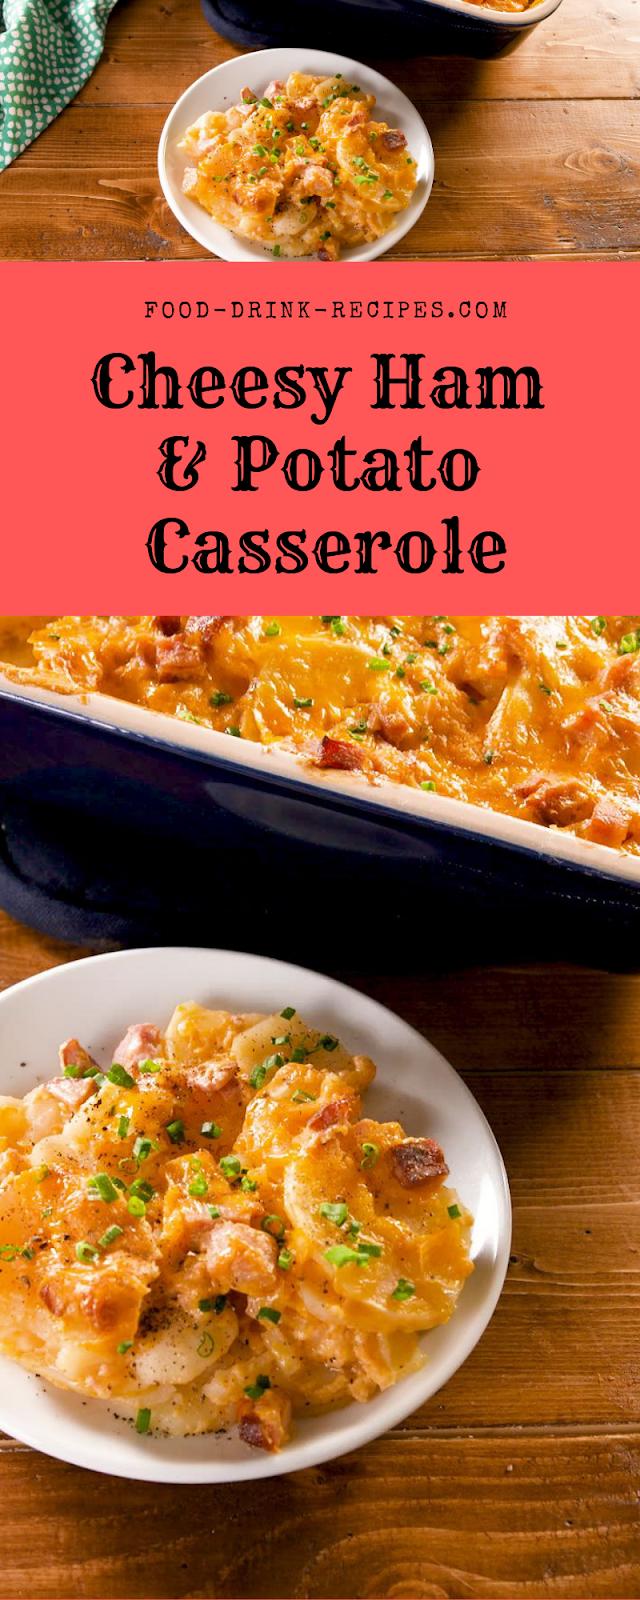 Cheesy Ham & Potato Casserole - food-drink-recipes.com